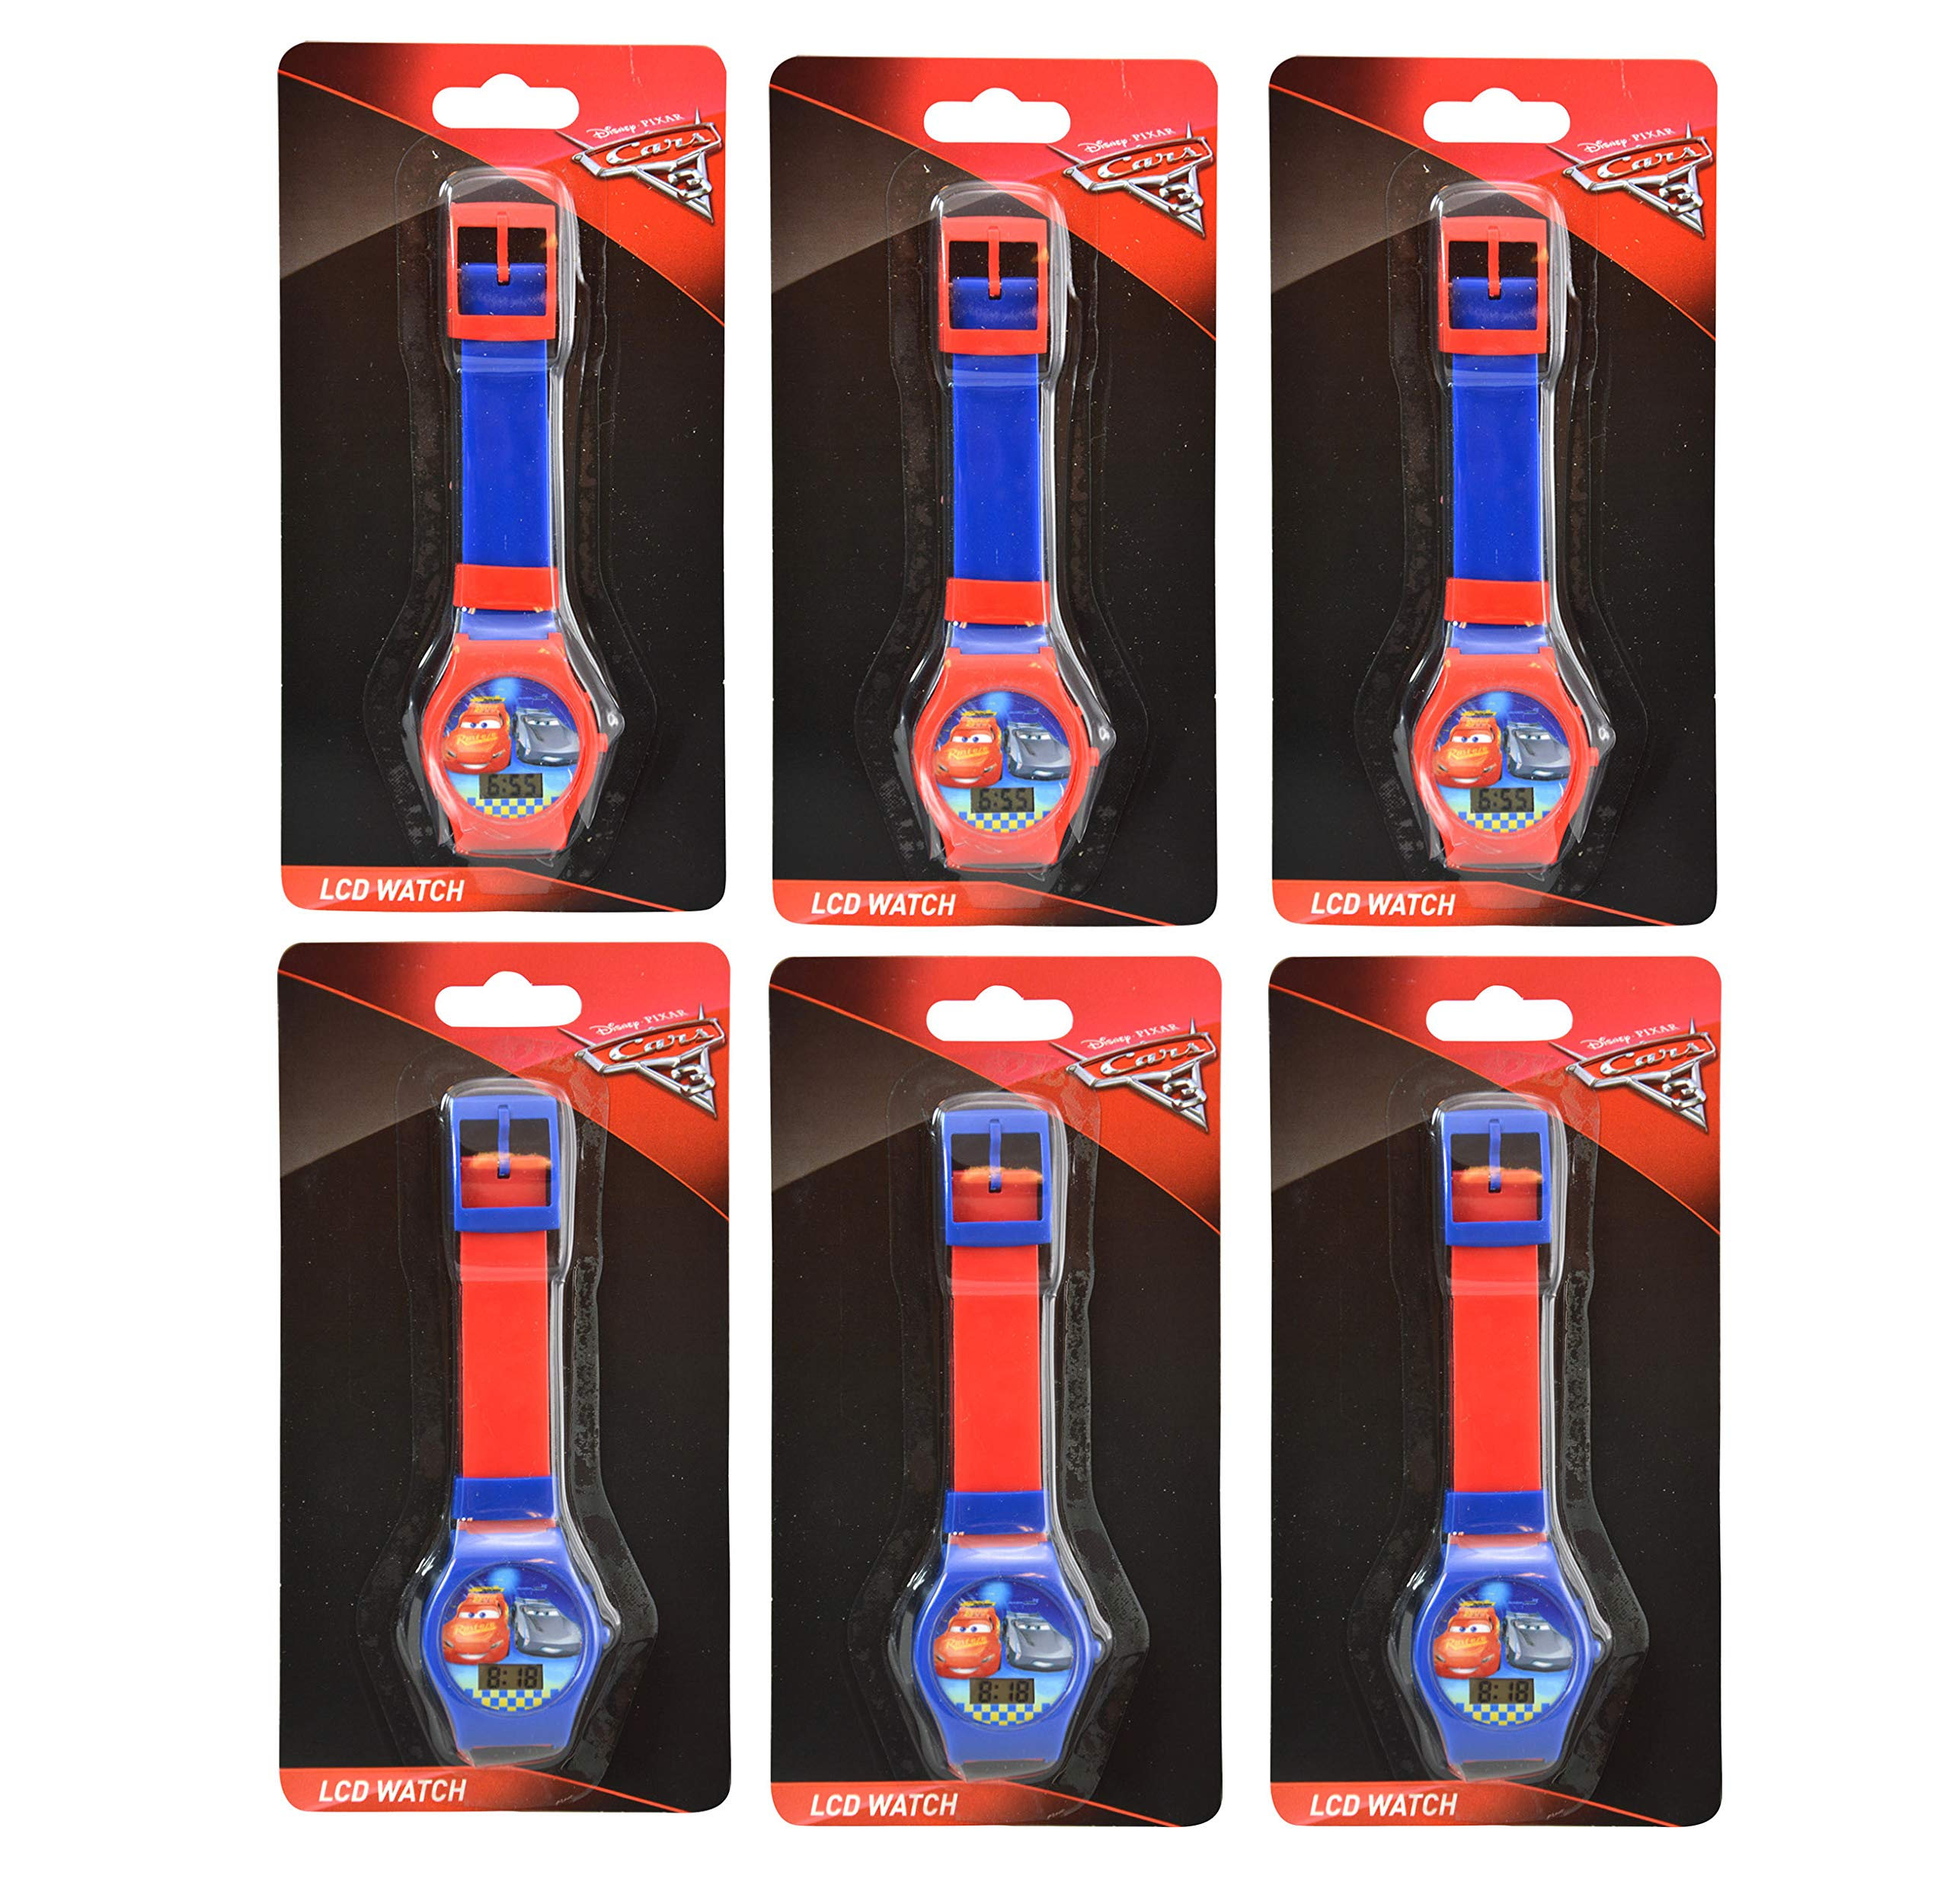 Karacter Box Disney Cars 3 LCD Digital Watch, 6-Pack Party Favors by Karacter Box (Image #1)